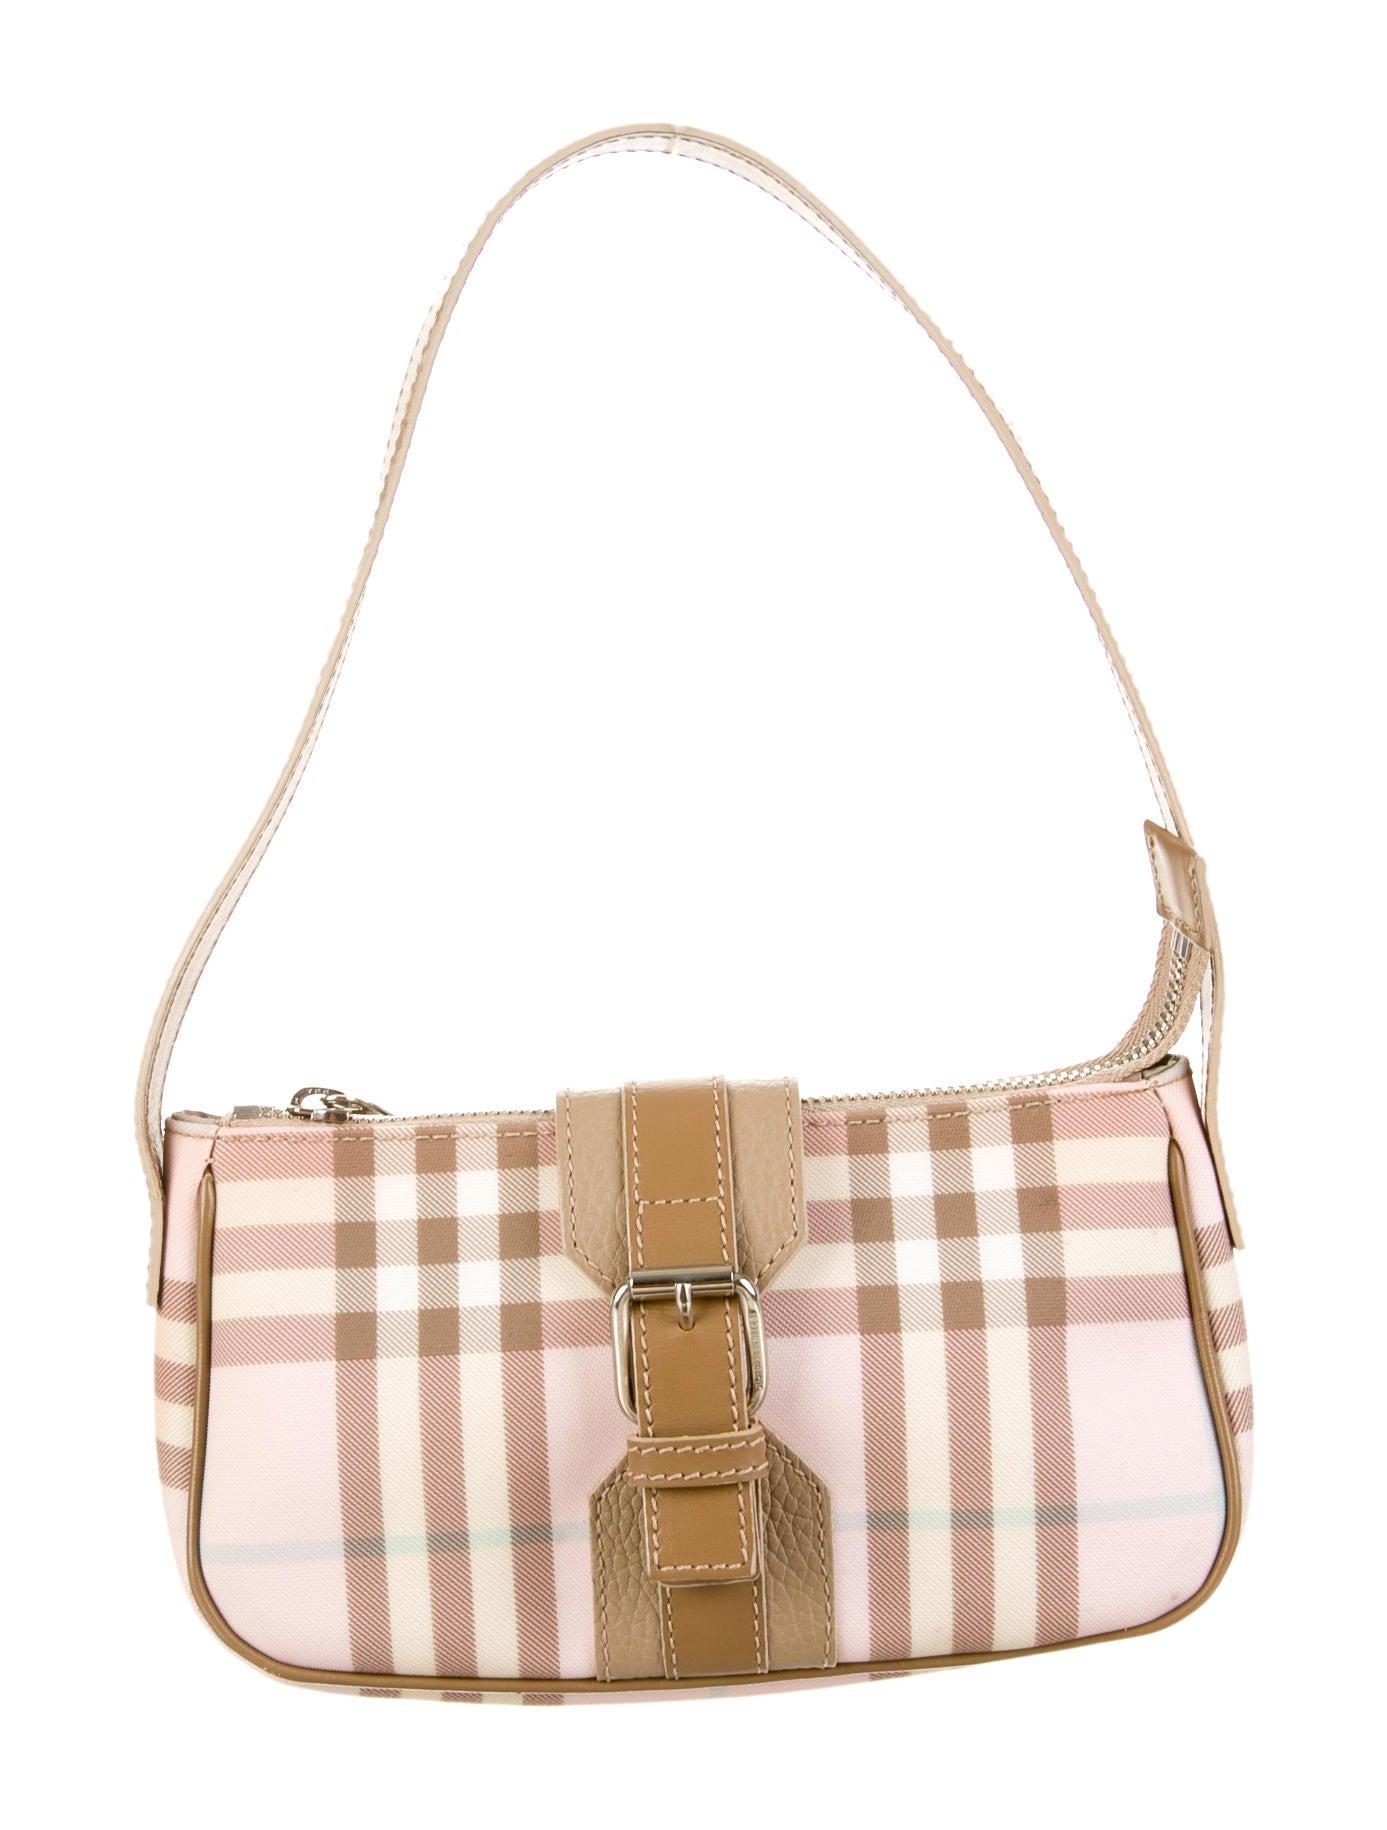 Burberry Shoulder Bag - Handbags - BUR34960 | The RealReal